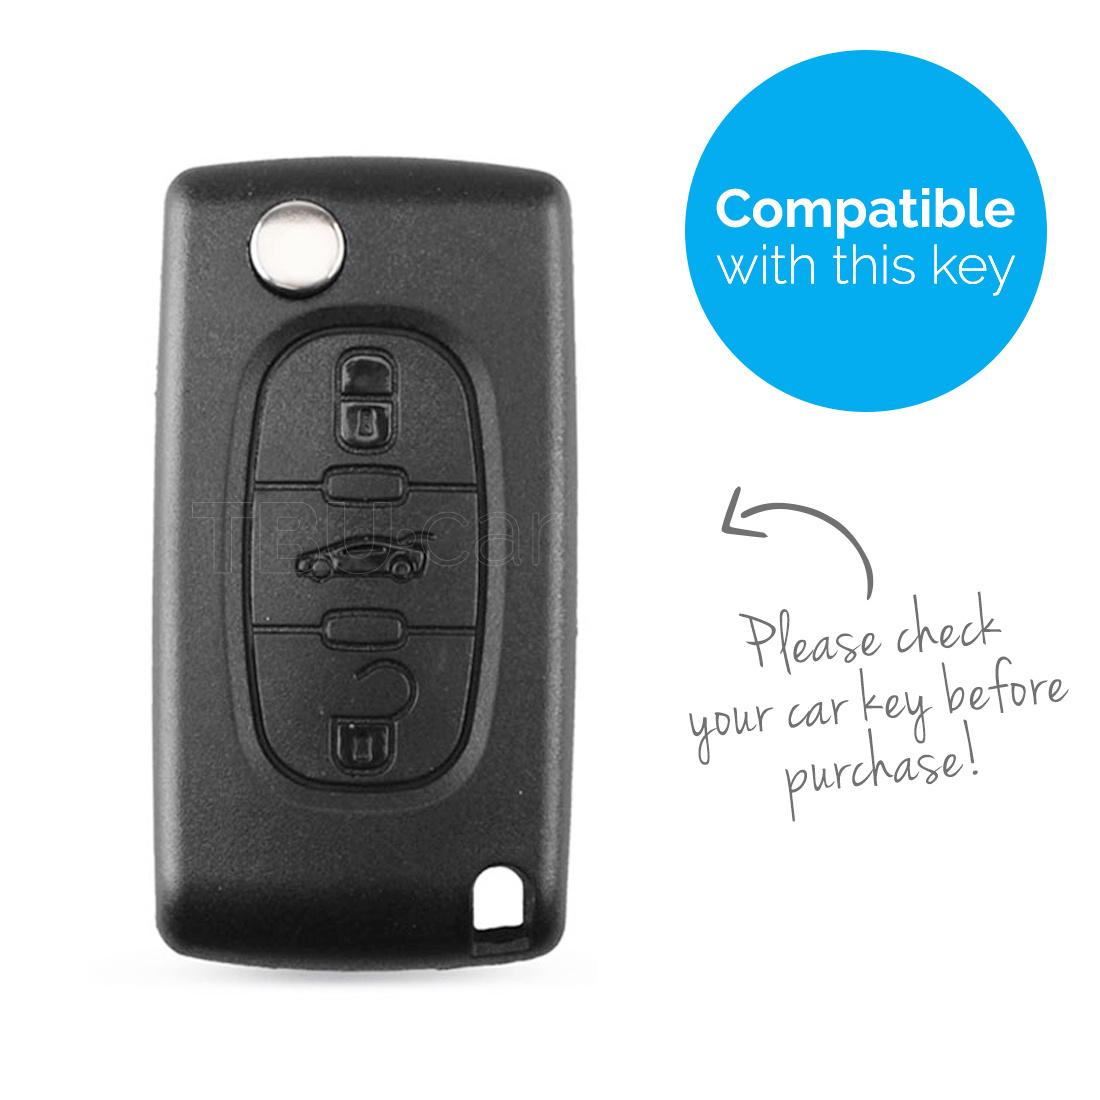 TBU car TBU car Sleutel cover compatibel met Peugeot - Silicone sleutelhoesje - beschermhoesje autosleutel - Wit